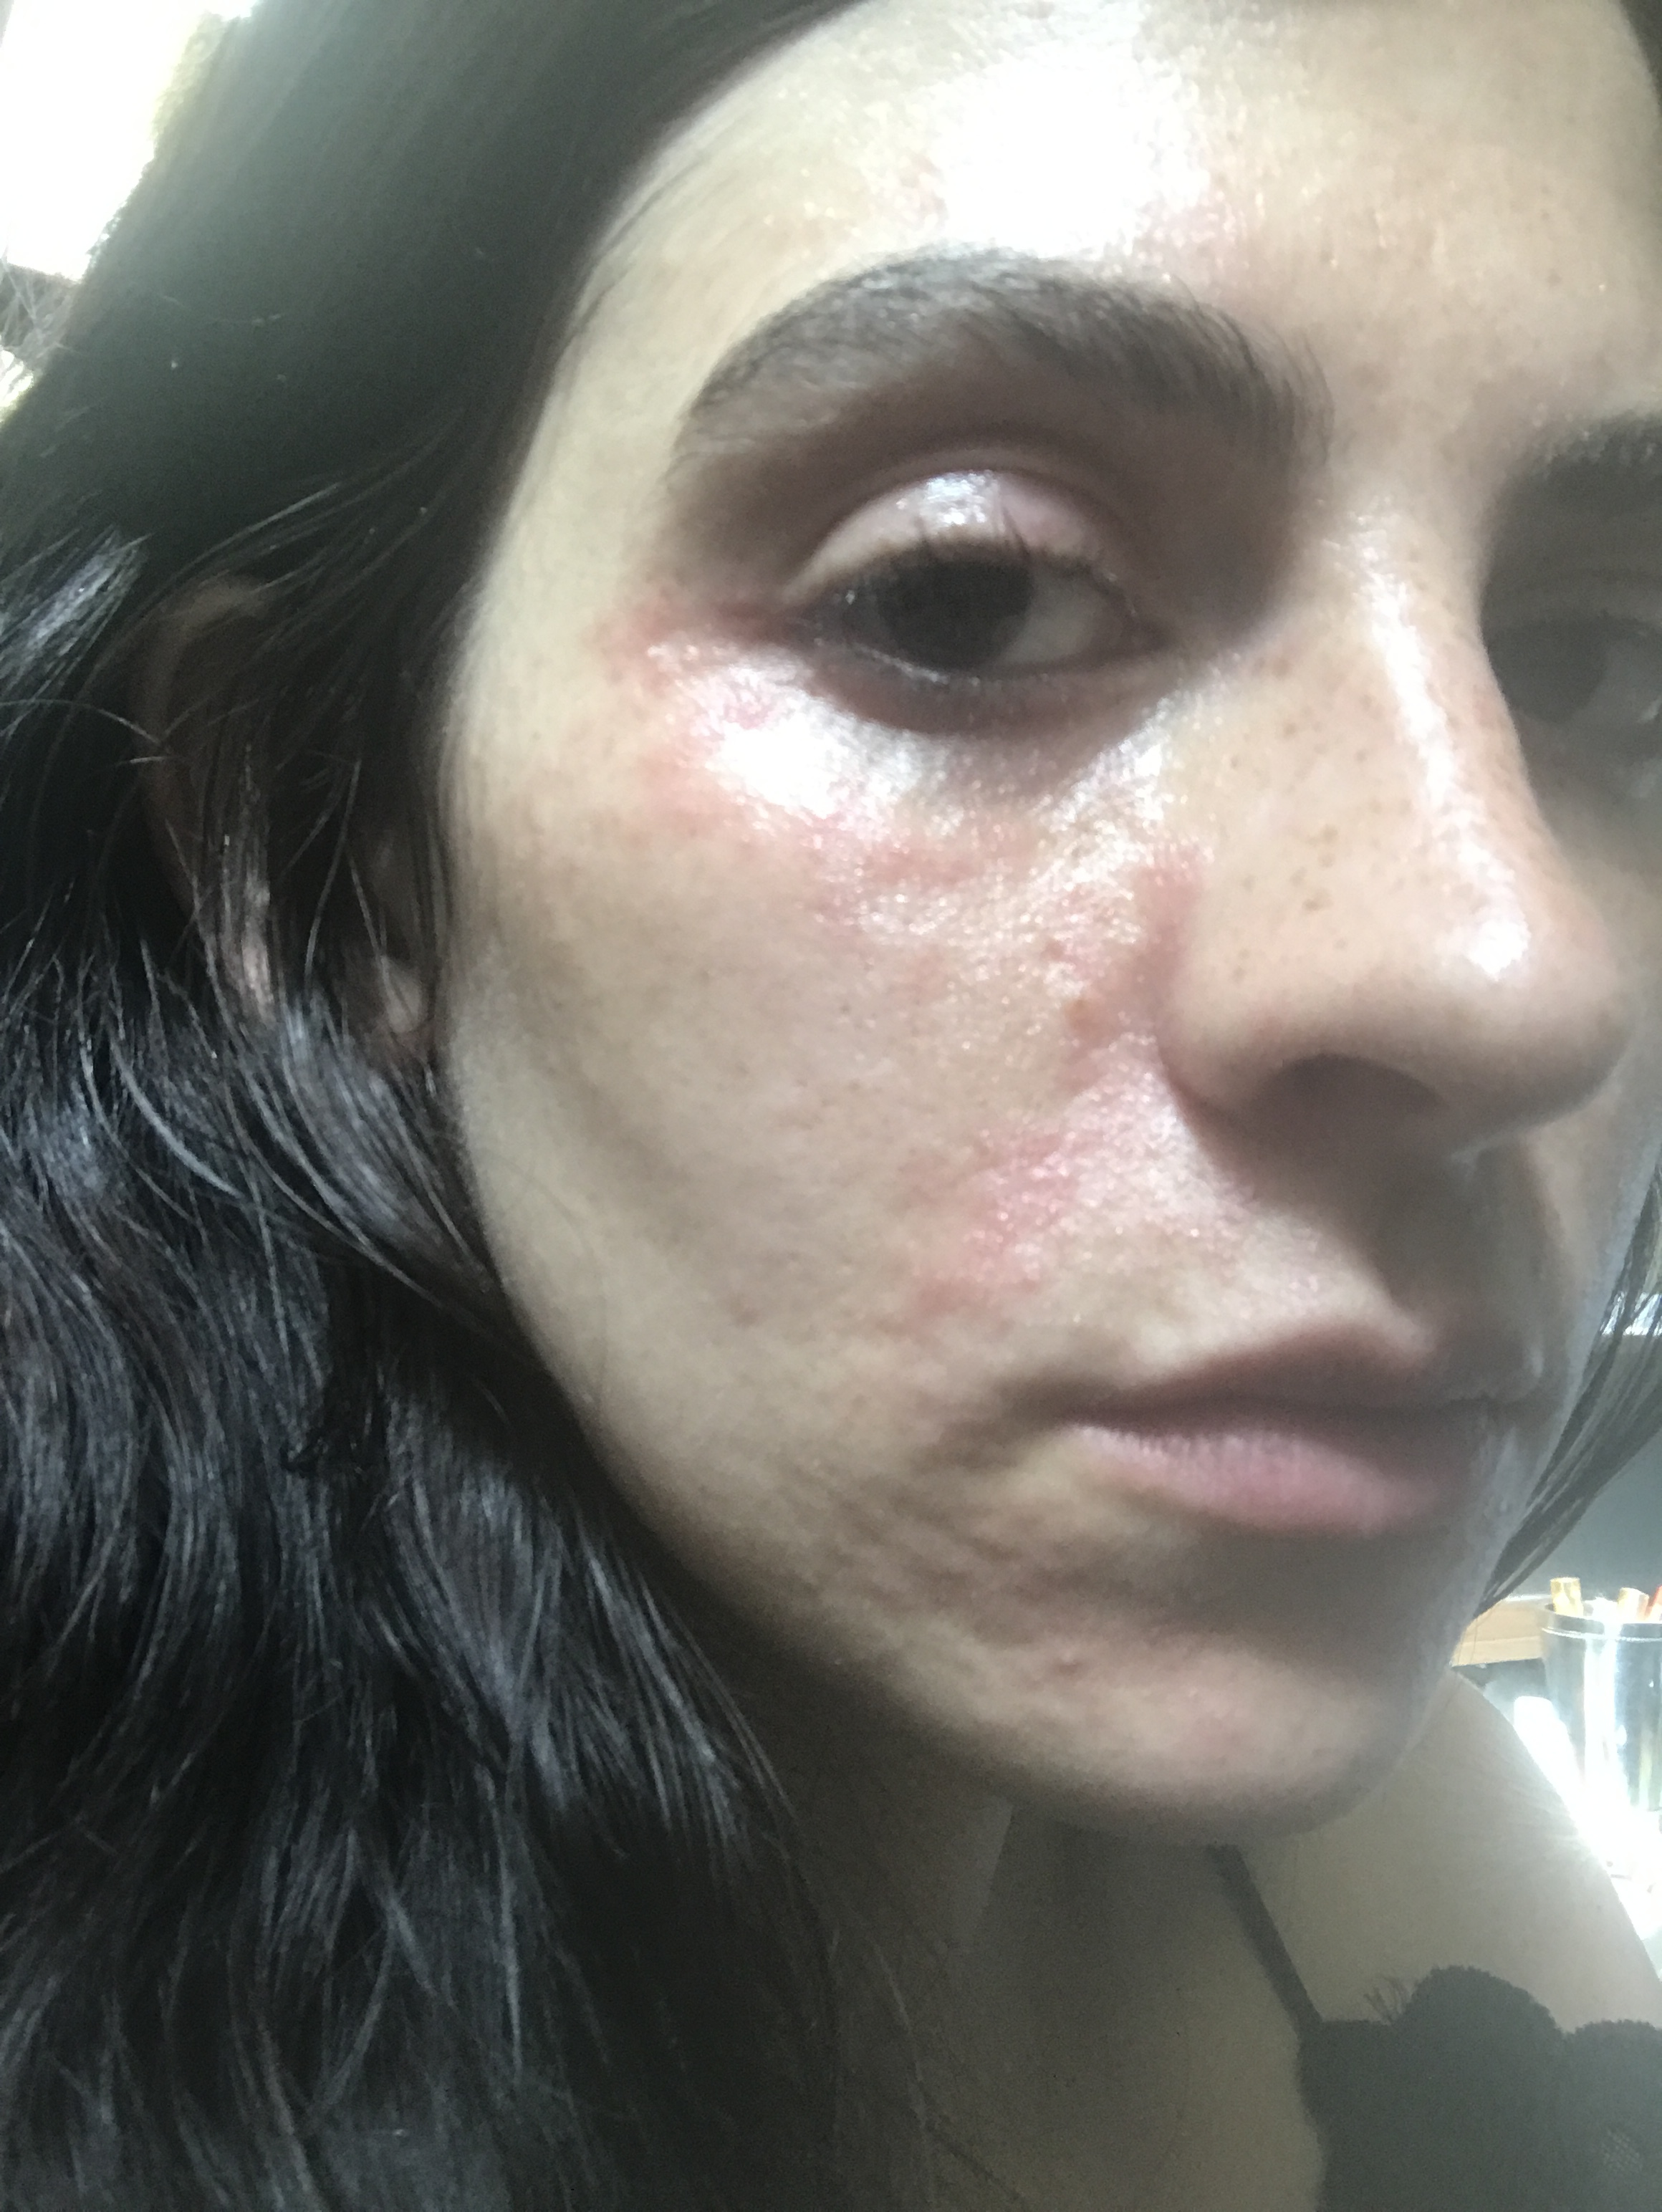 periorbital-dermatitis.JPG